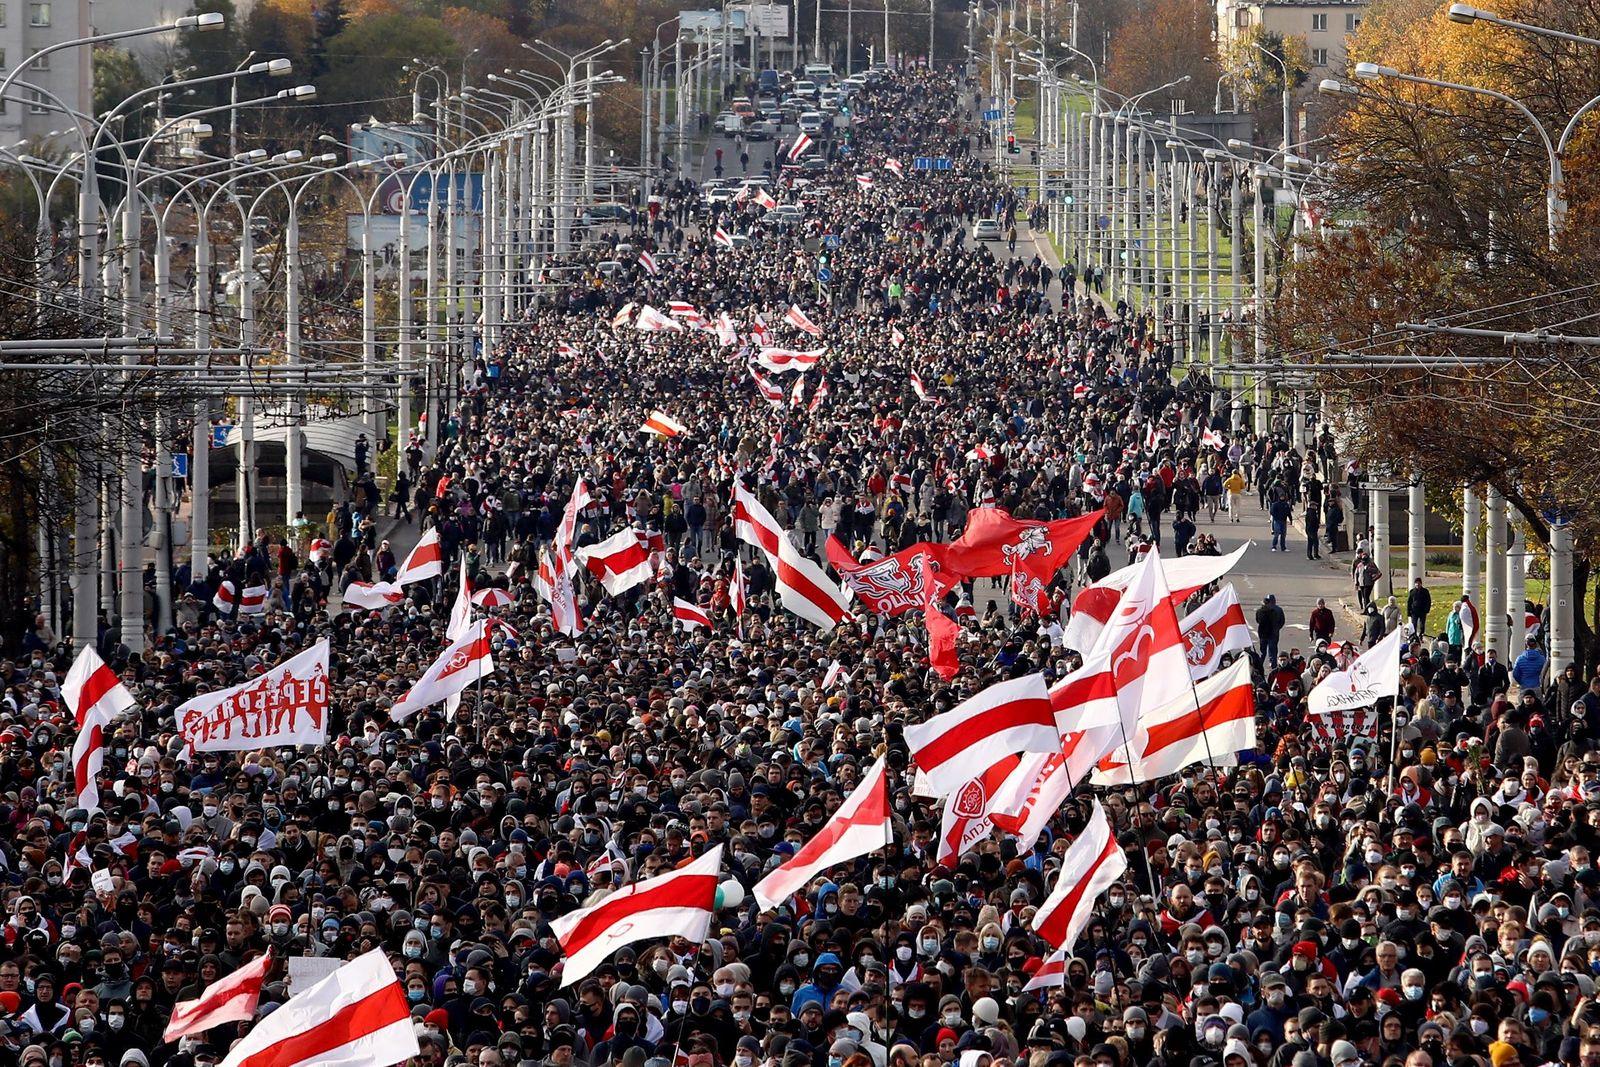 unrest-politics-BELARUS-POLITICS-UNREST-DEMO